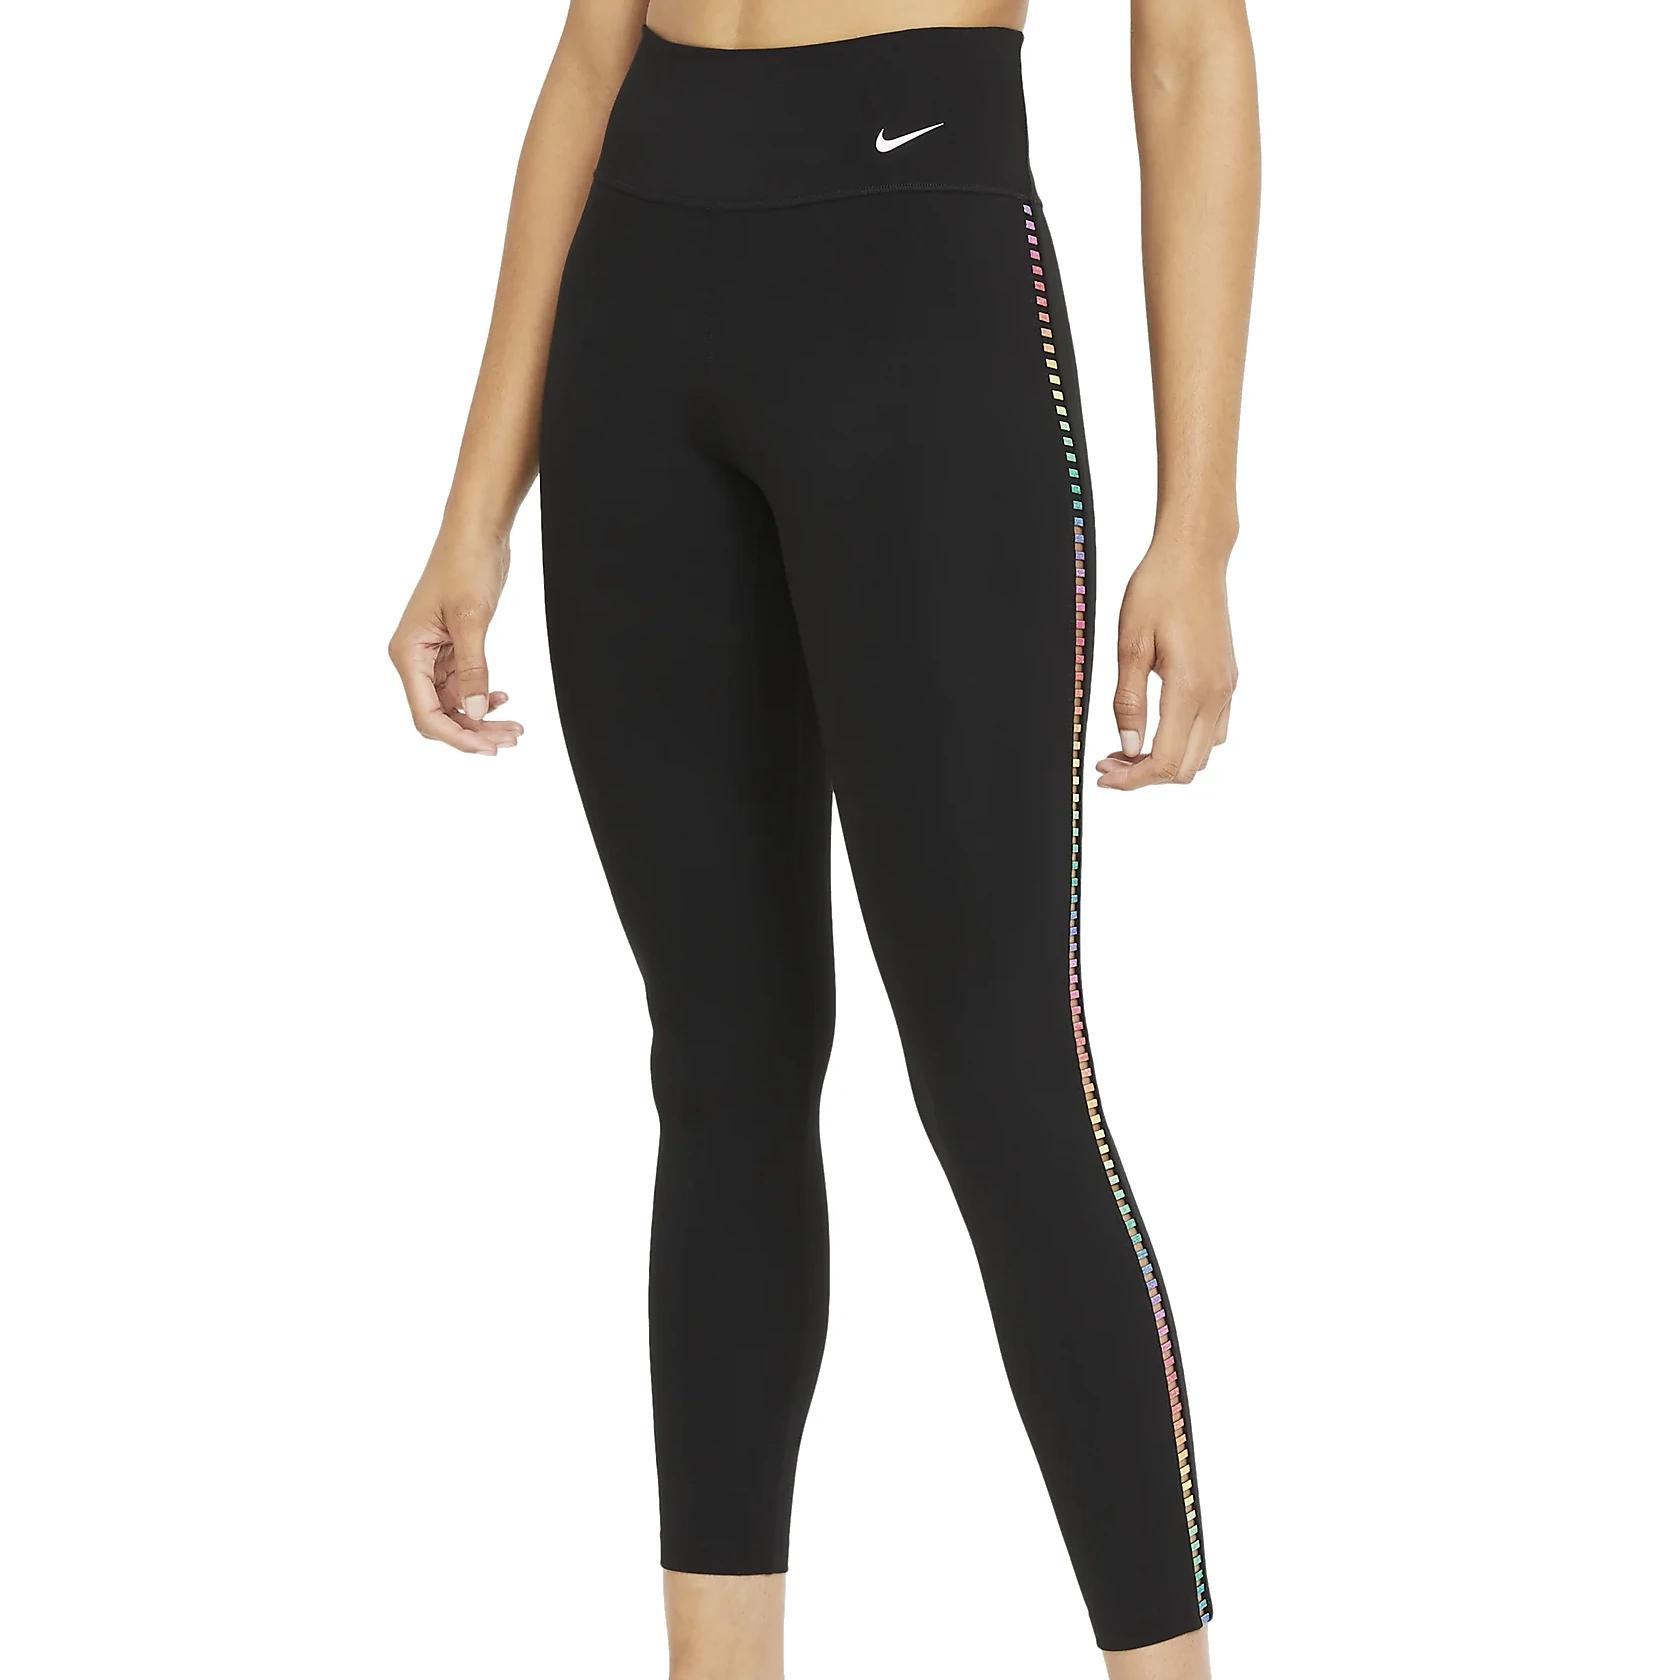 Nike One Rainbow Ladder 7/8 Mallas para mujer - black/white DA0844-010